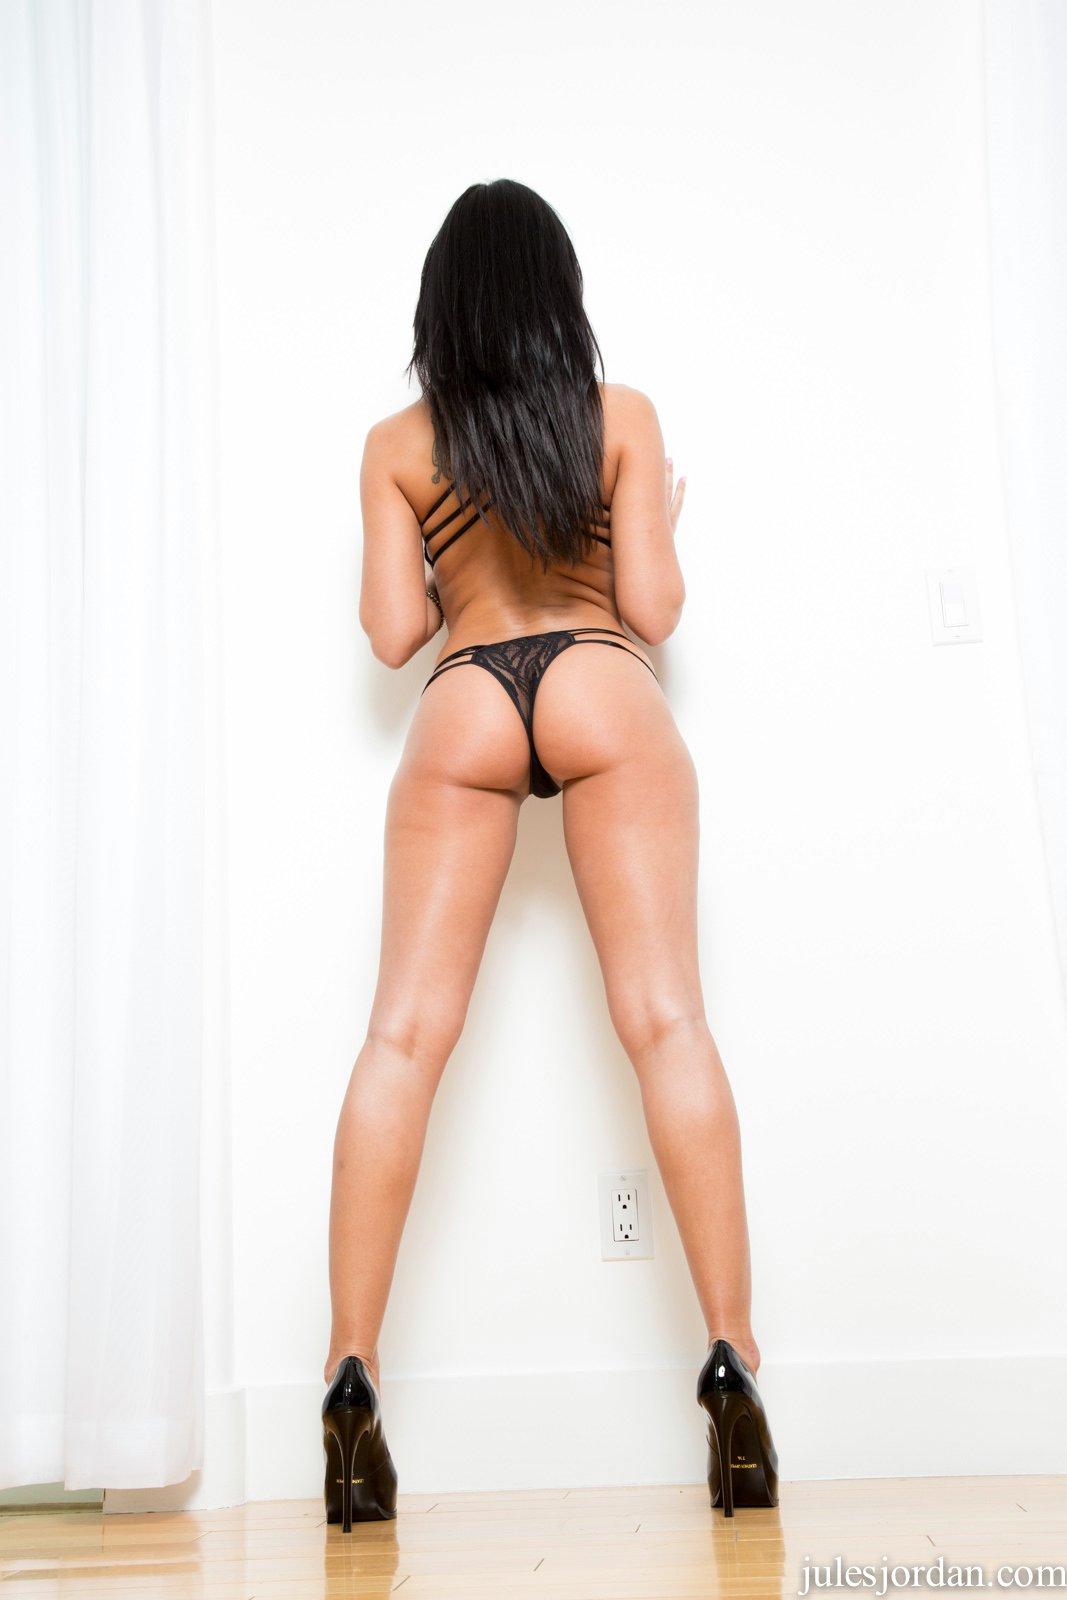 An asian porn actor fucked an asian woman - 2 part 8